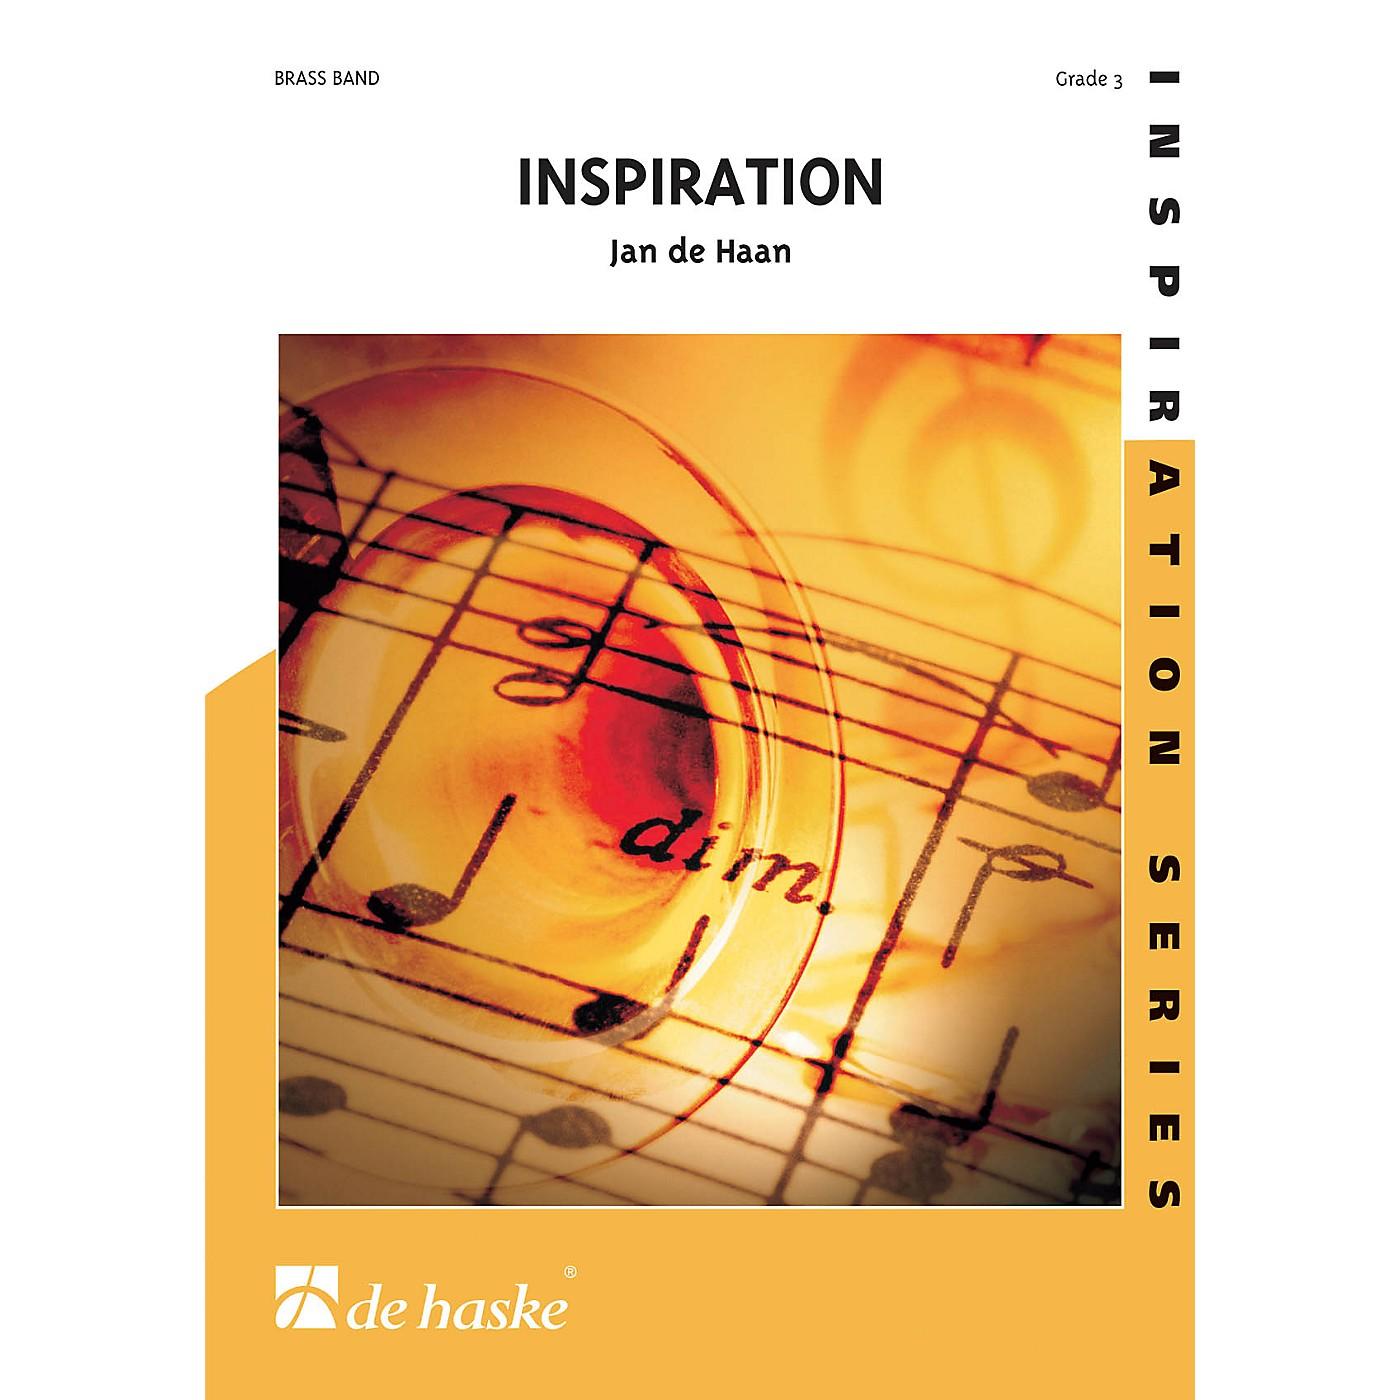 Hal Leonard Inspiration Score Only Concert Band thumbnail